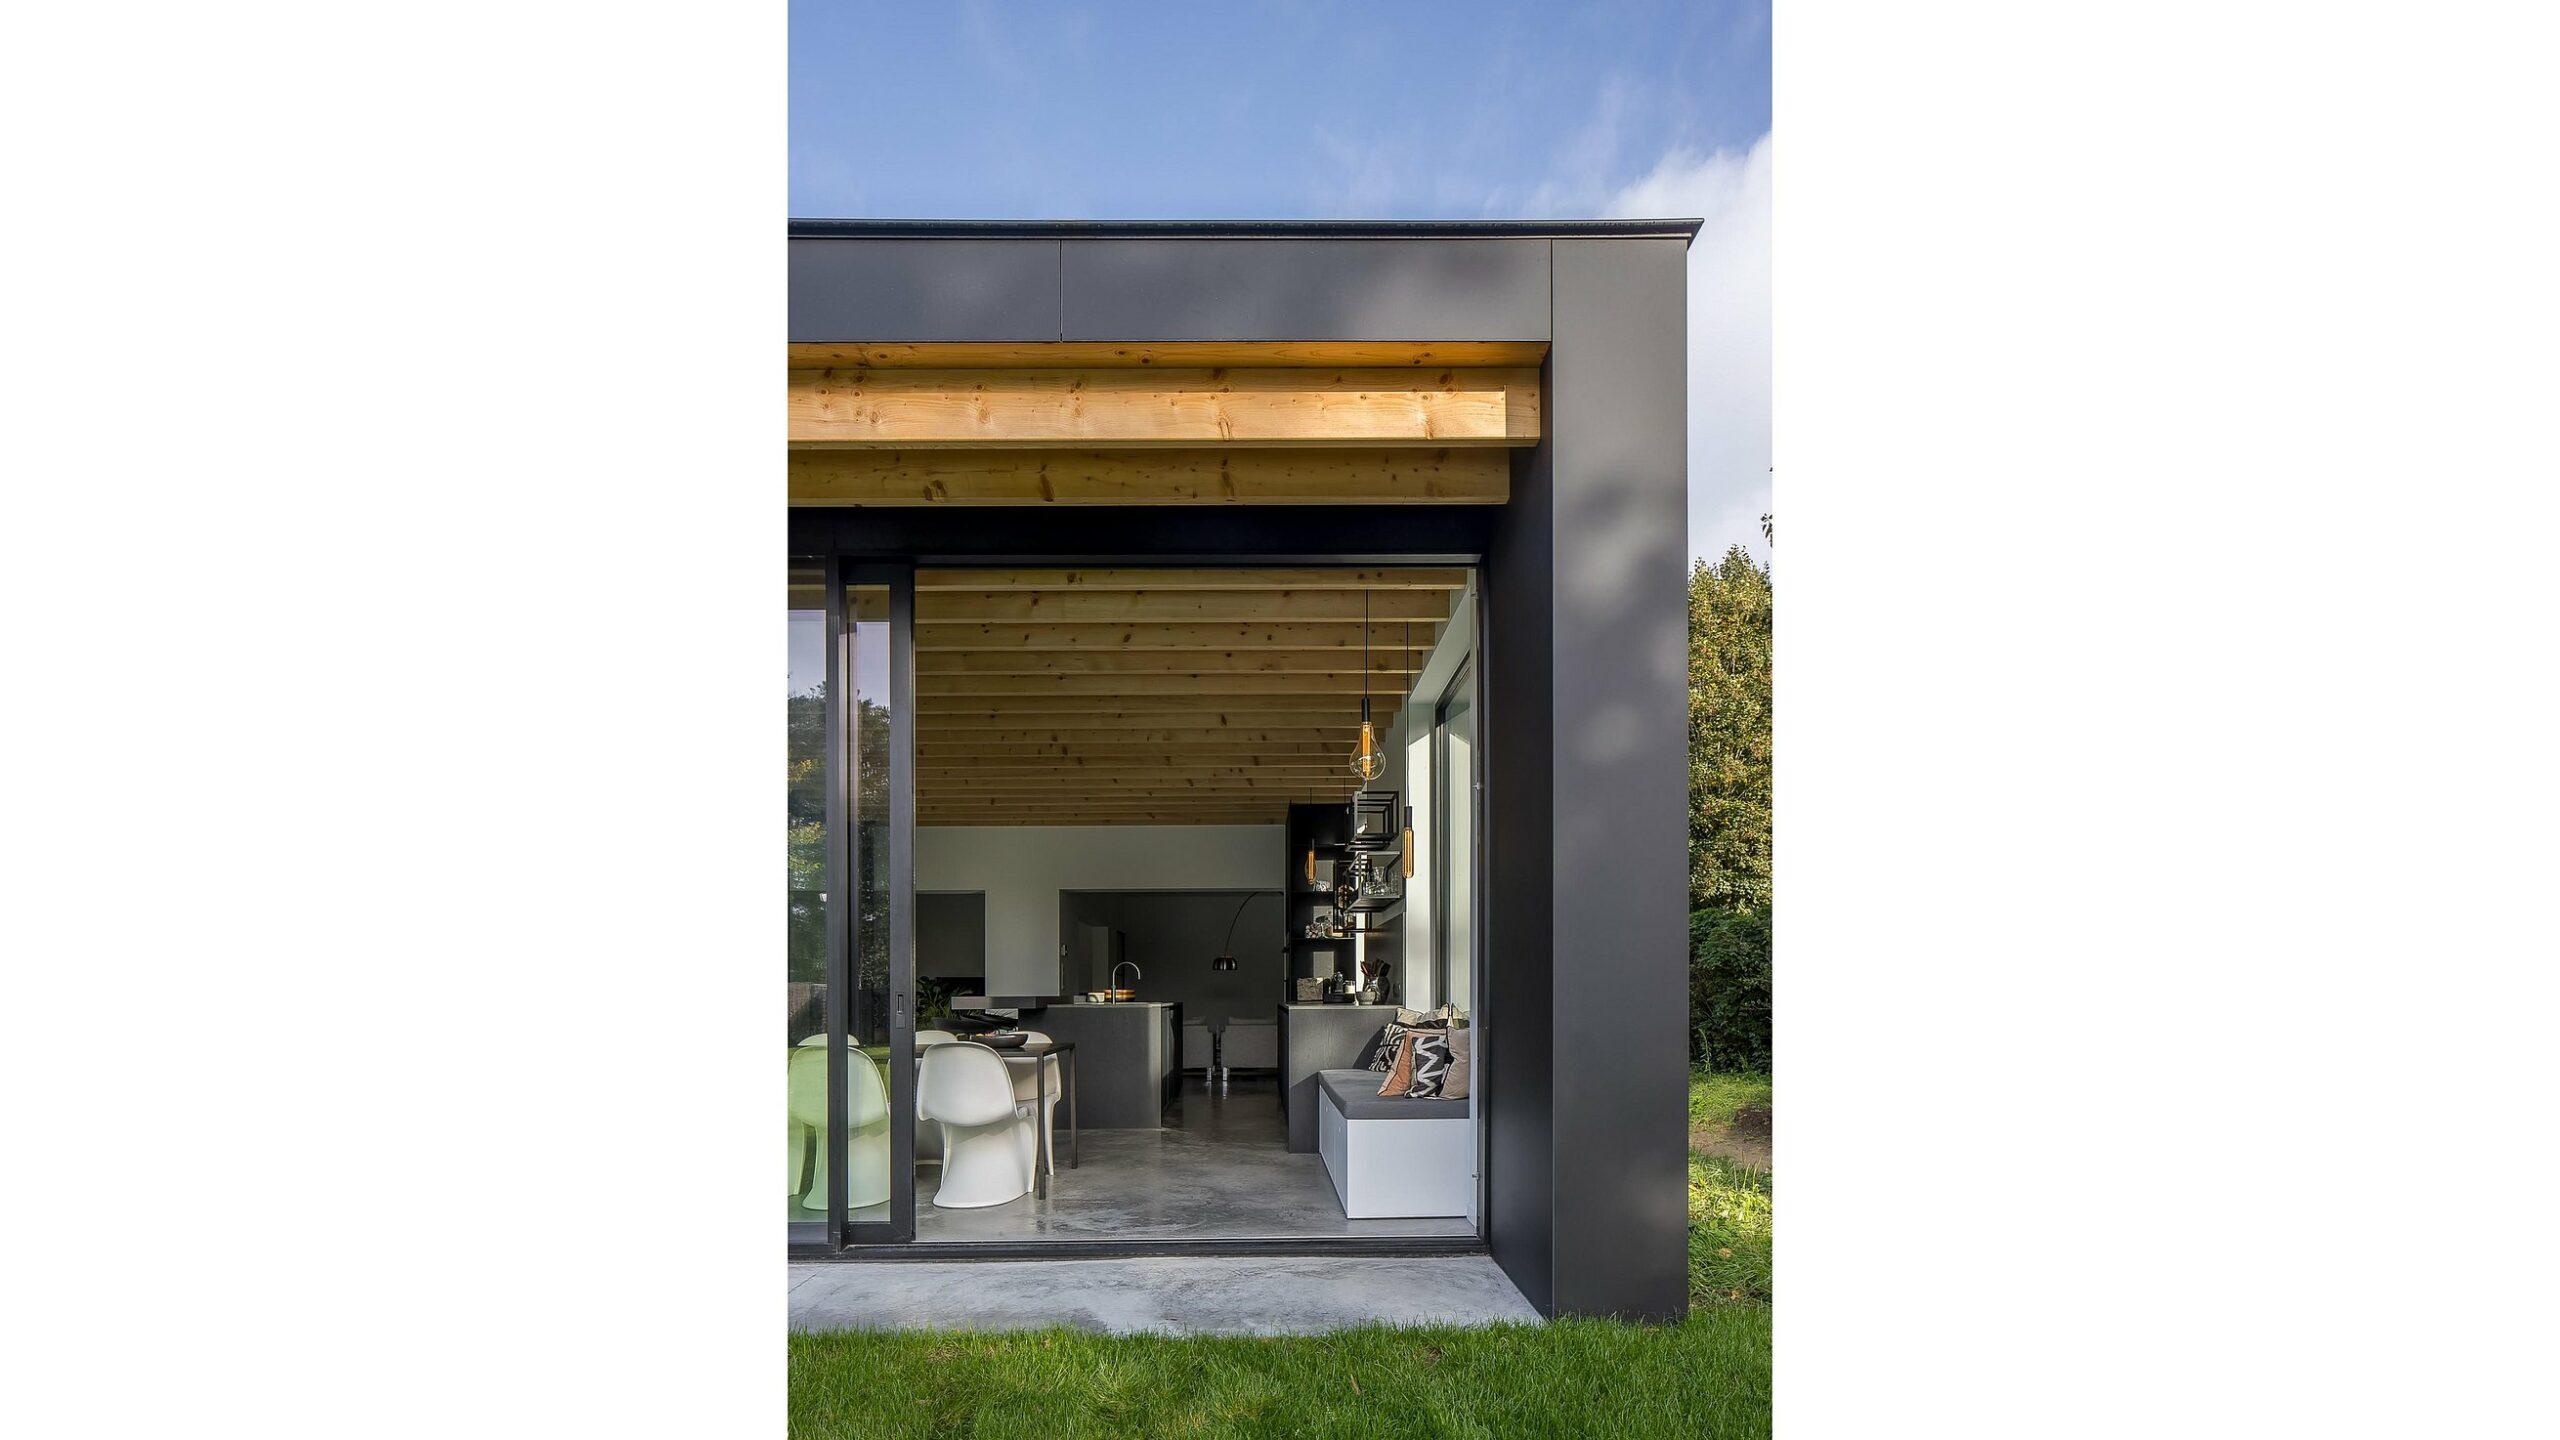 csm bulthaup ligna recta cafeine black oak 05 6dbc6f69c3 scaled | Baeyens & Beck architecten Gent | architect nieuwbouw renovatie interieur | high end | architectenbureau